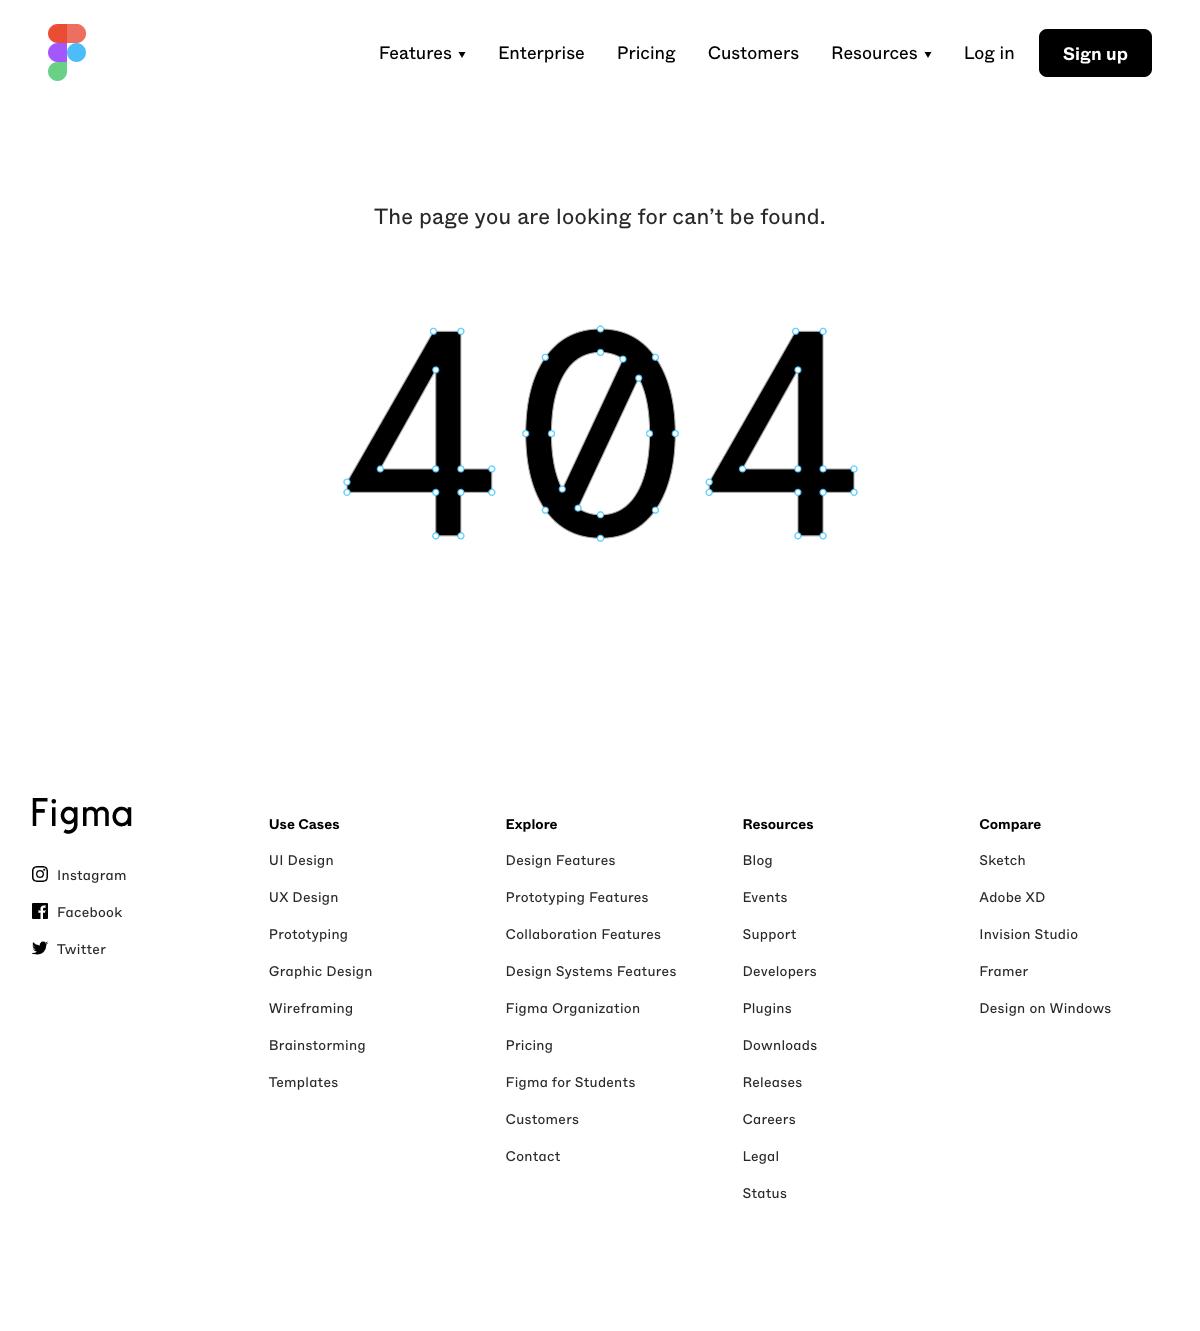 Figma - 404 Error page